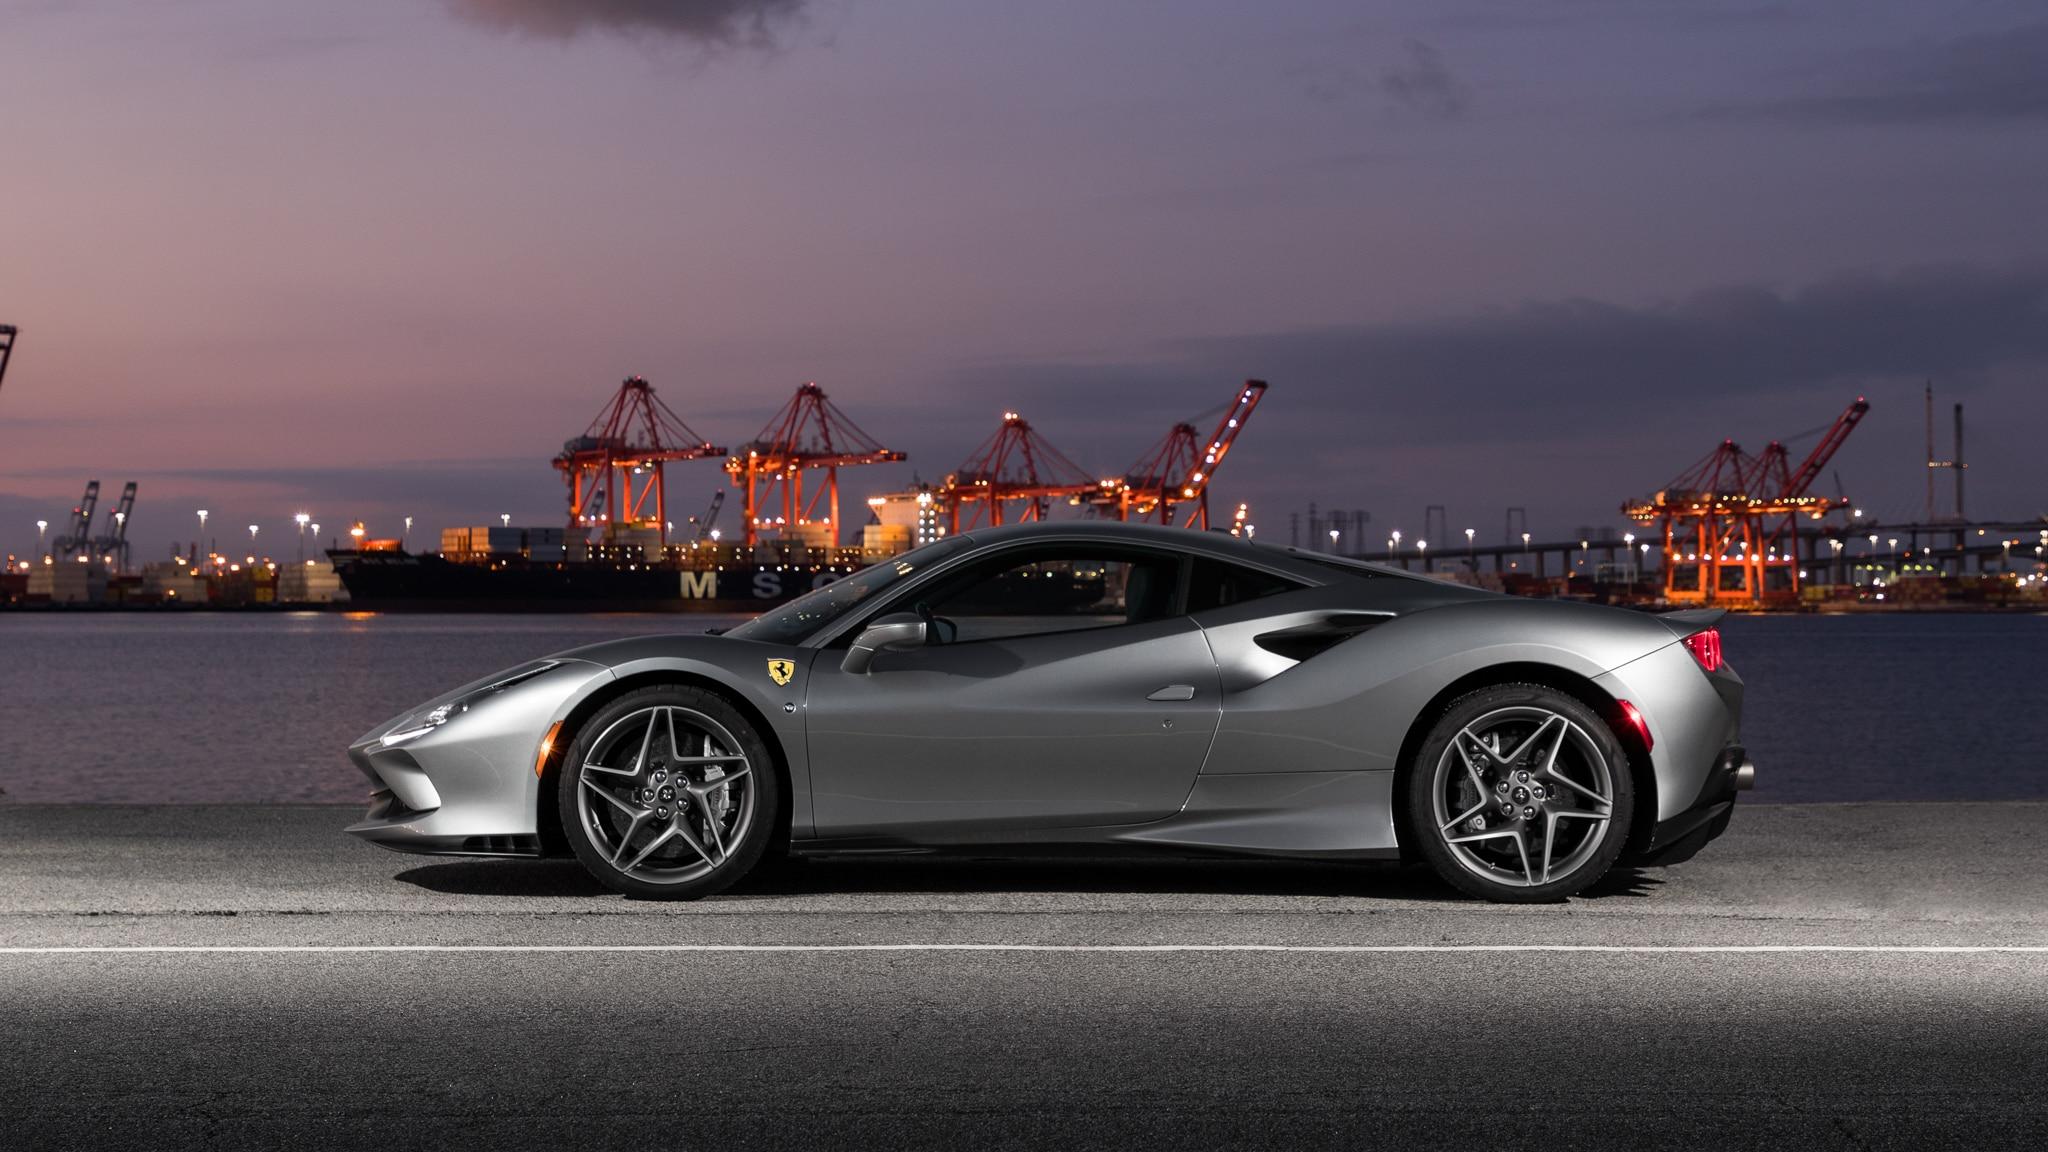 2020 Ferrari F8 Tributo Q A Automobile Readers Questions Answered